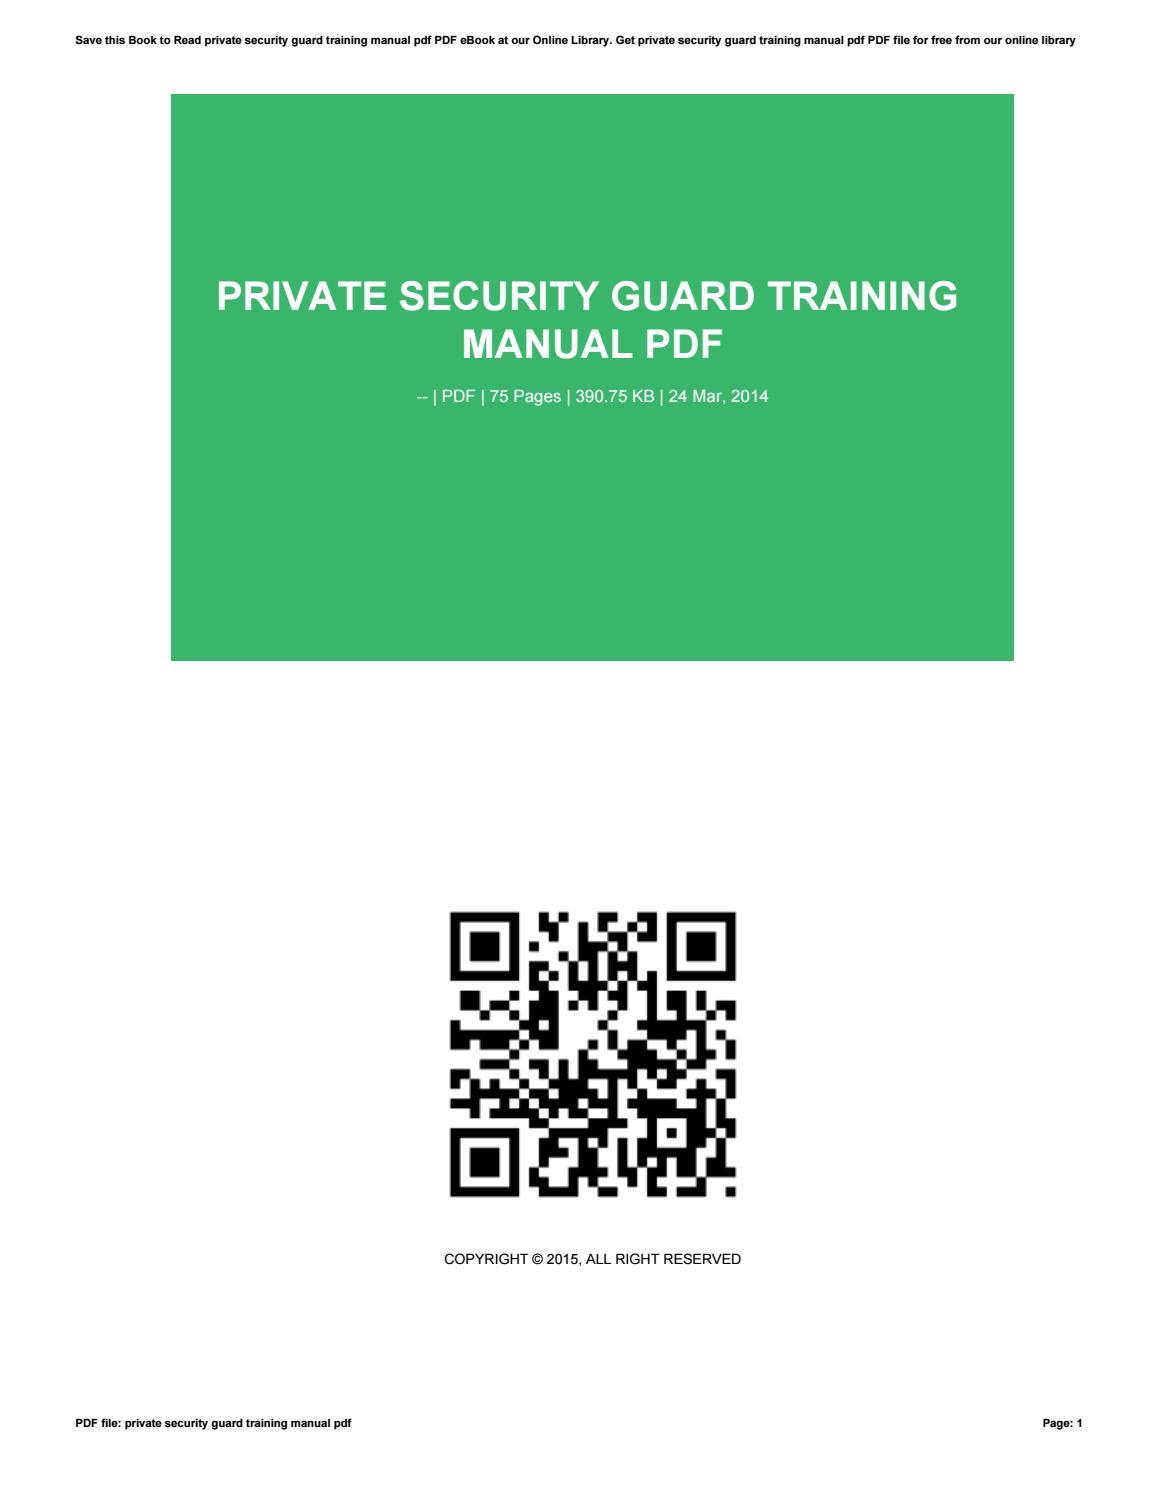 Private security guard training manual pdf by MatthewMusgrove3302 - issuu